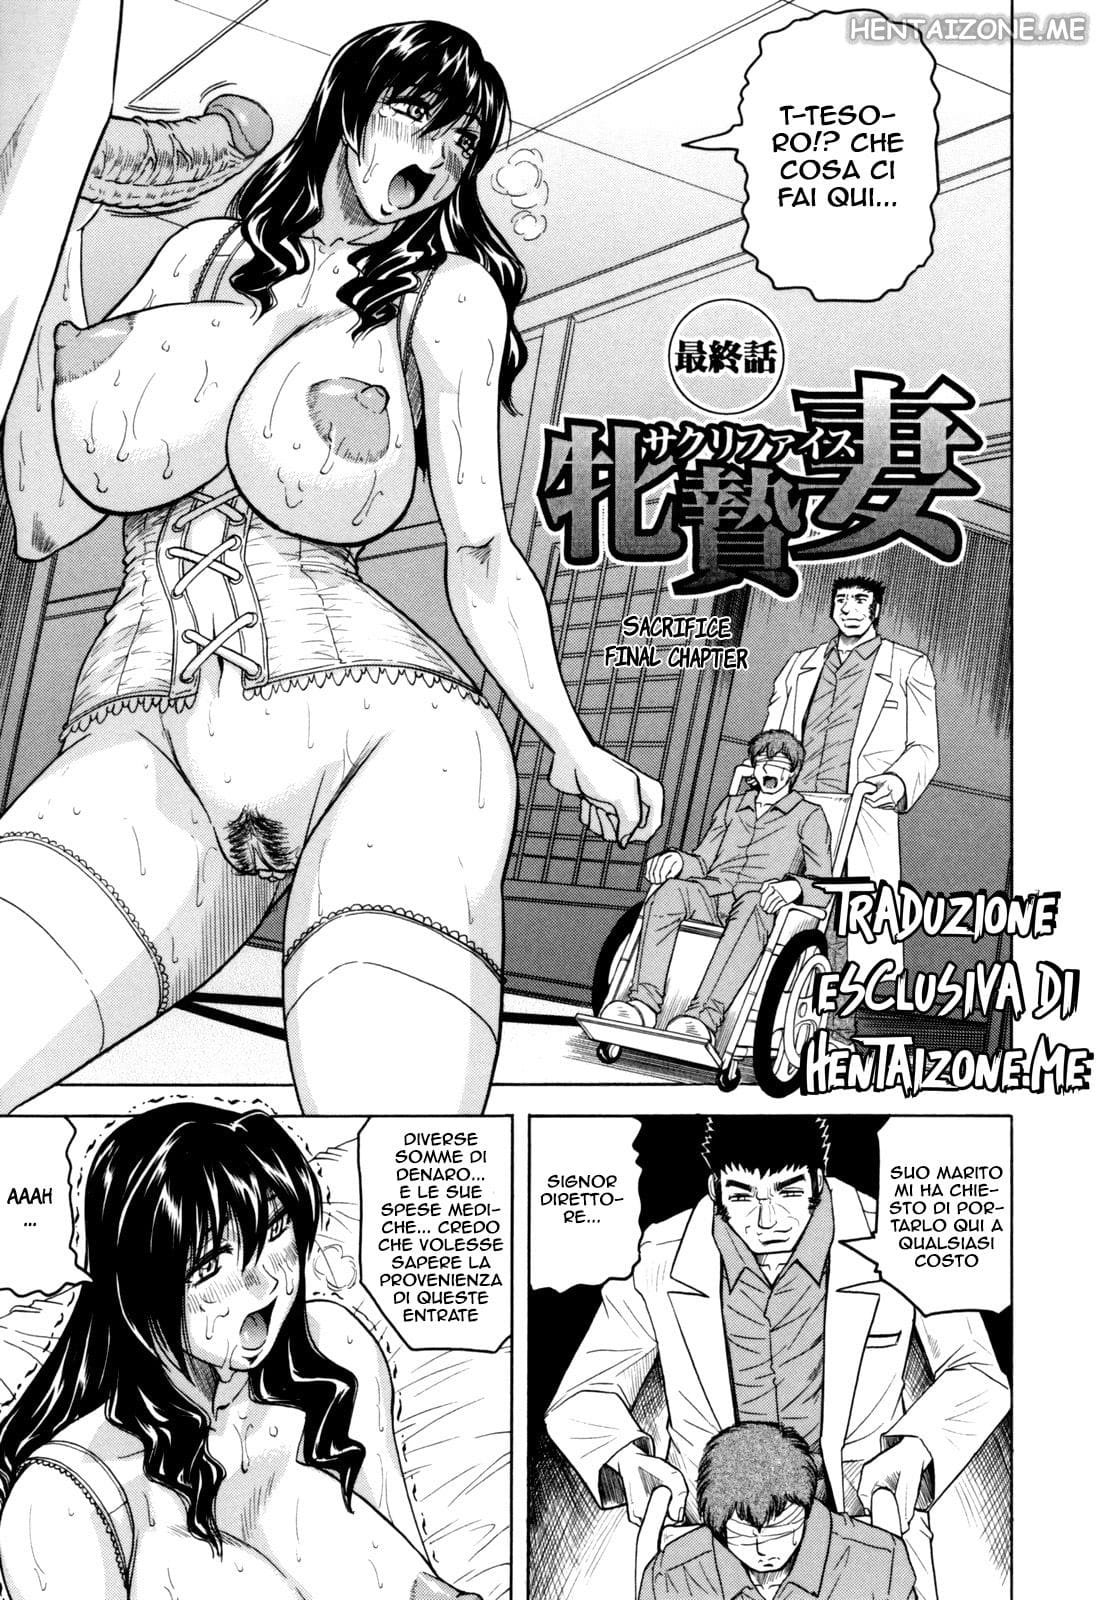 Moglie innocente hentai